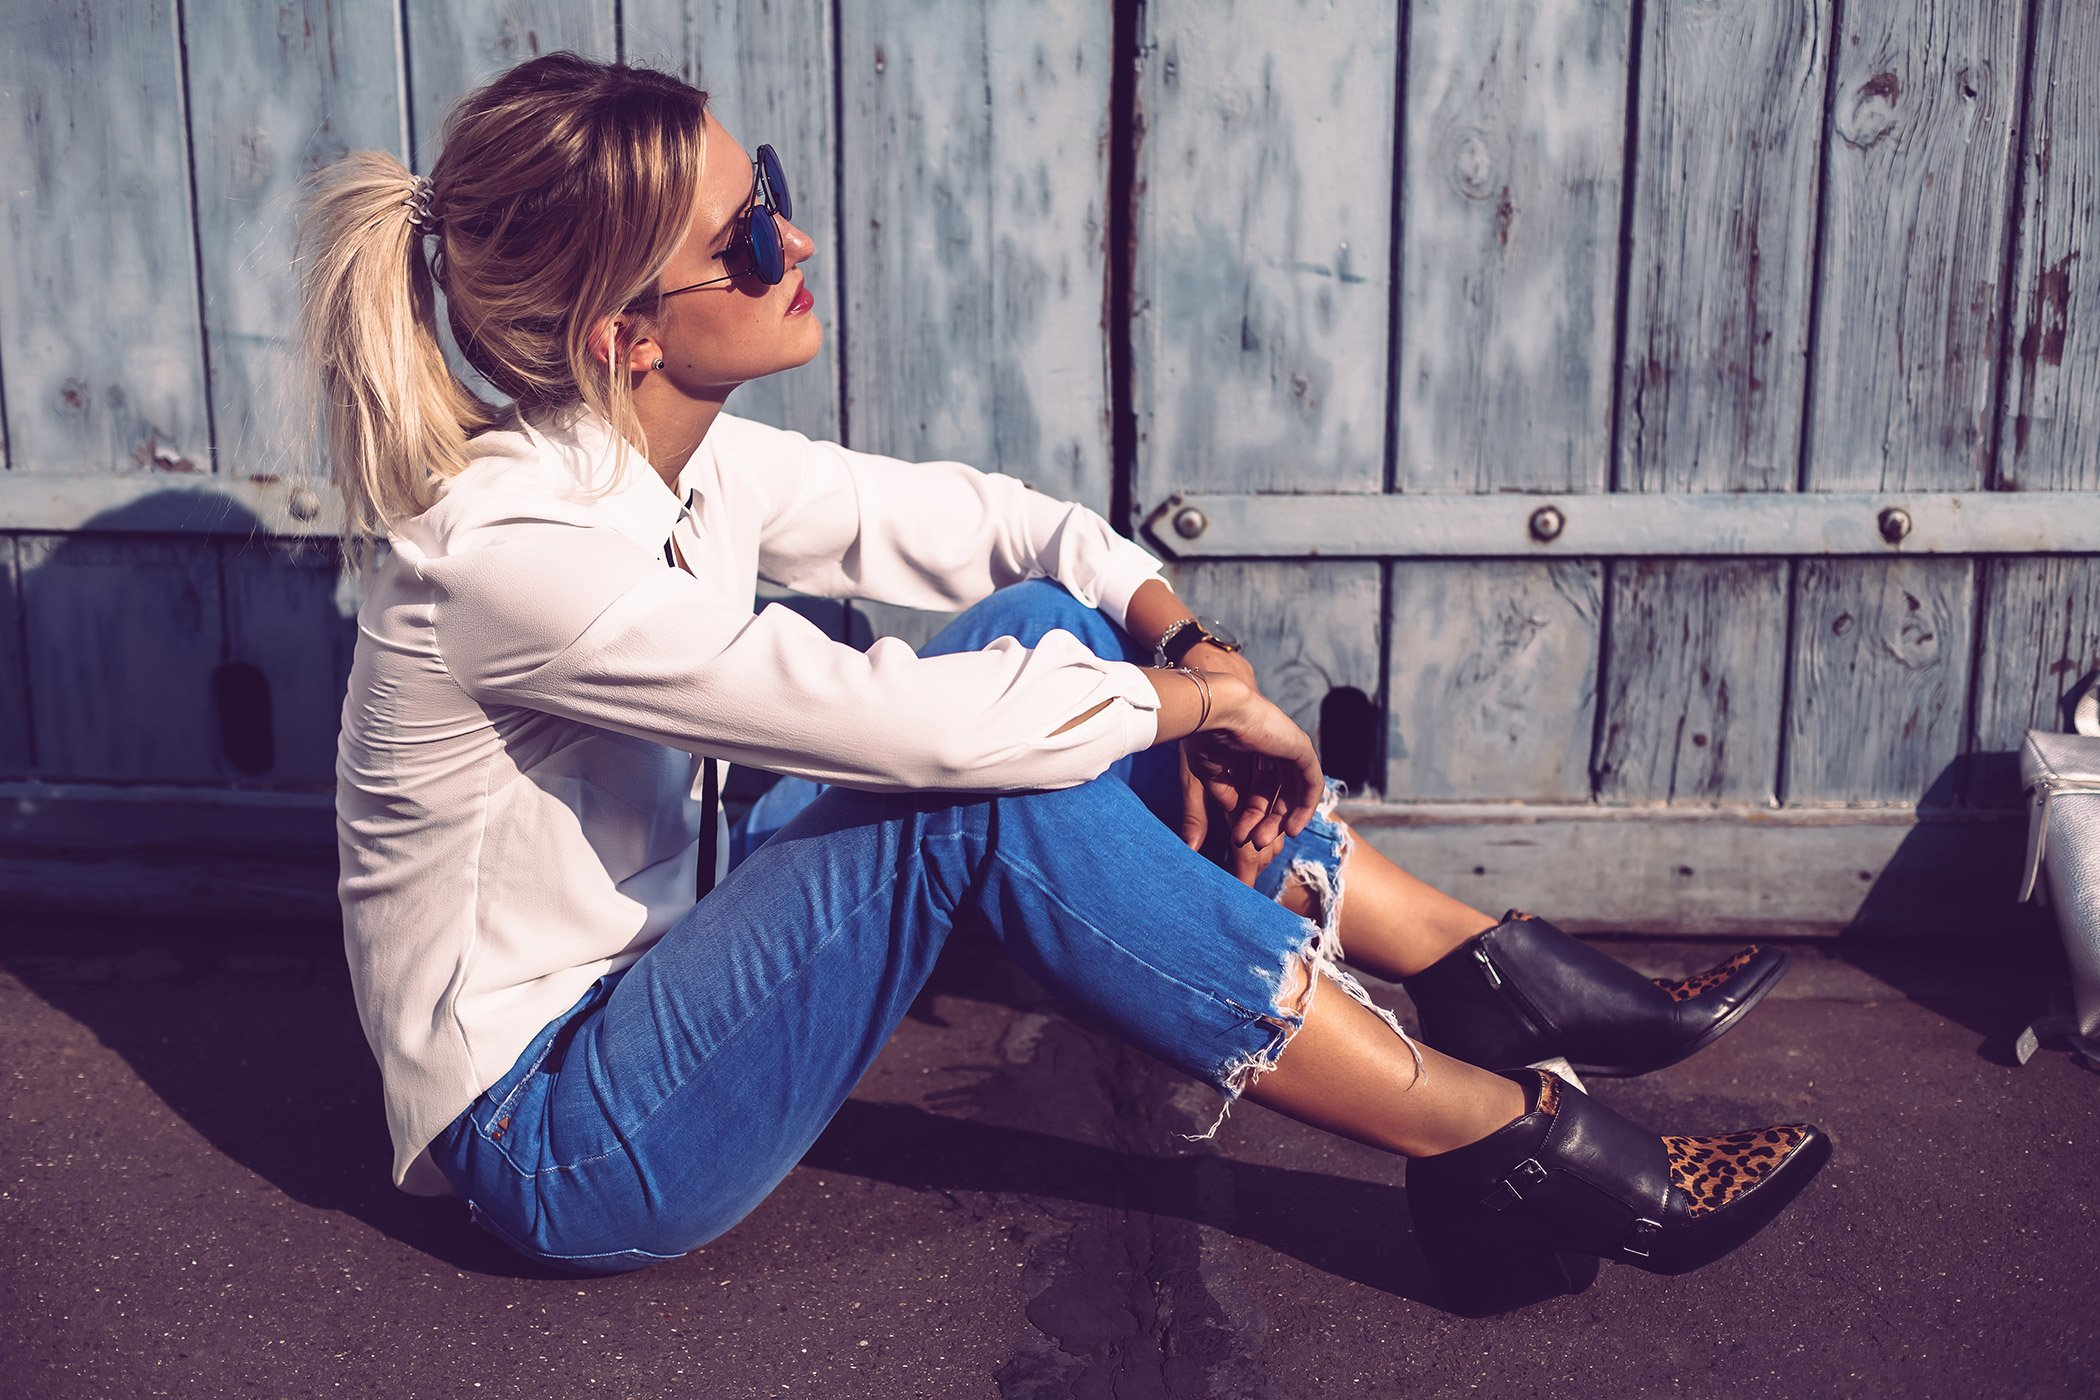 leo-an-cut-off-jeans-6